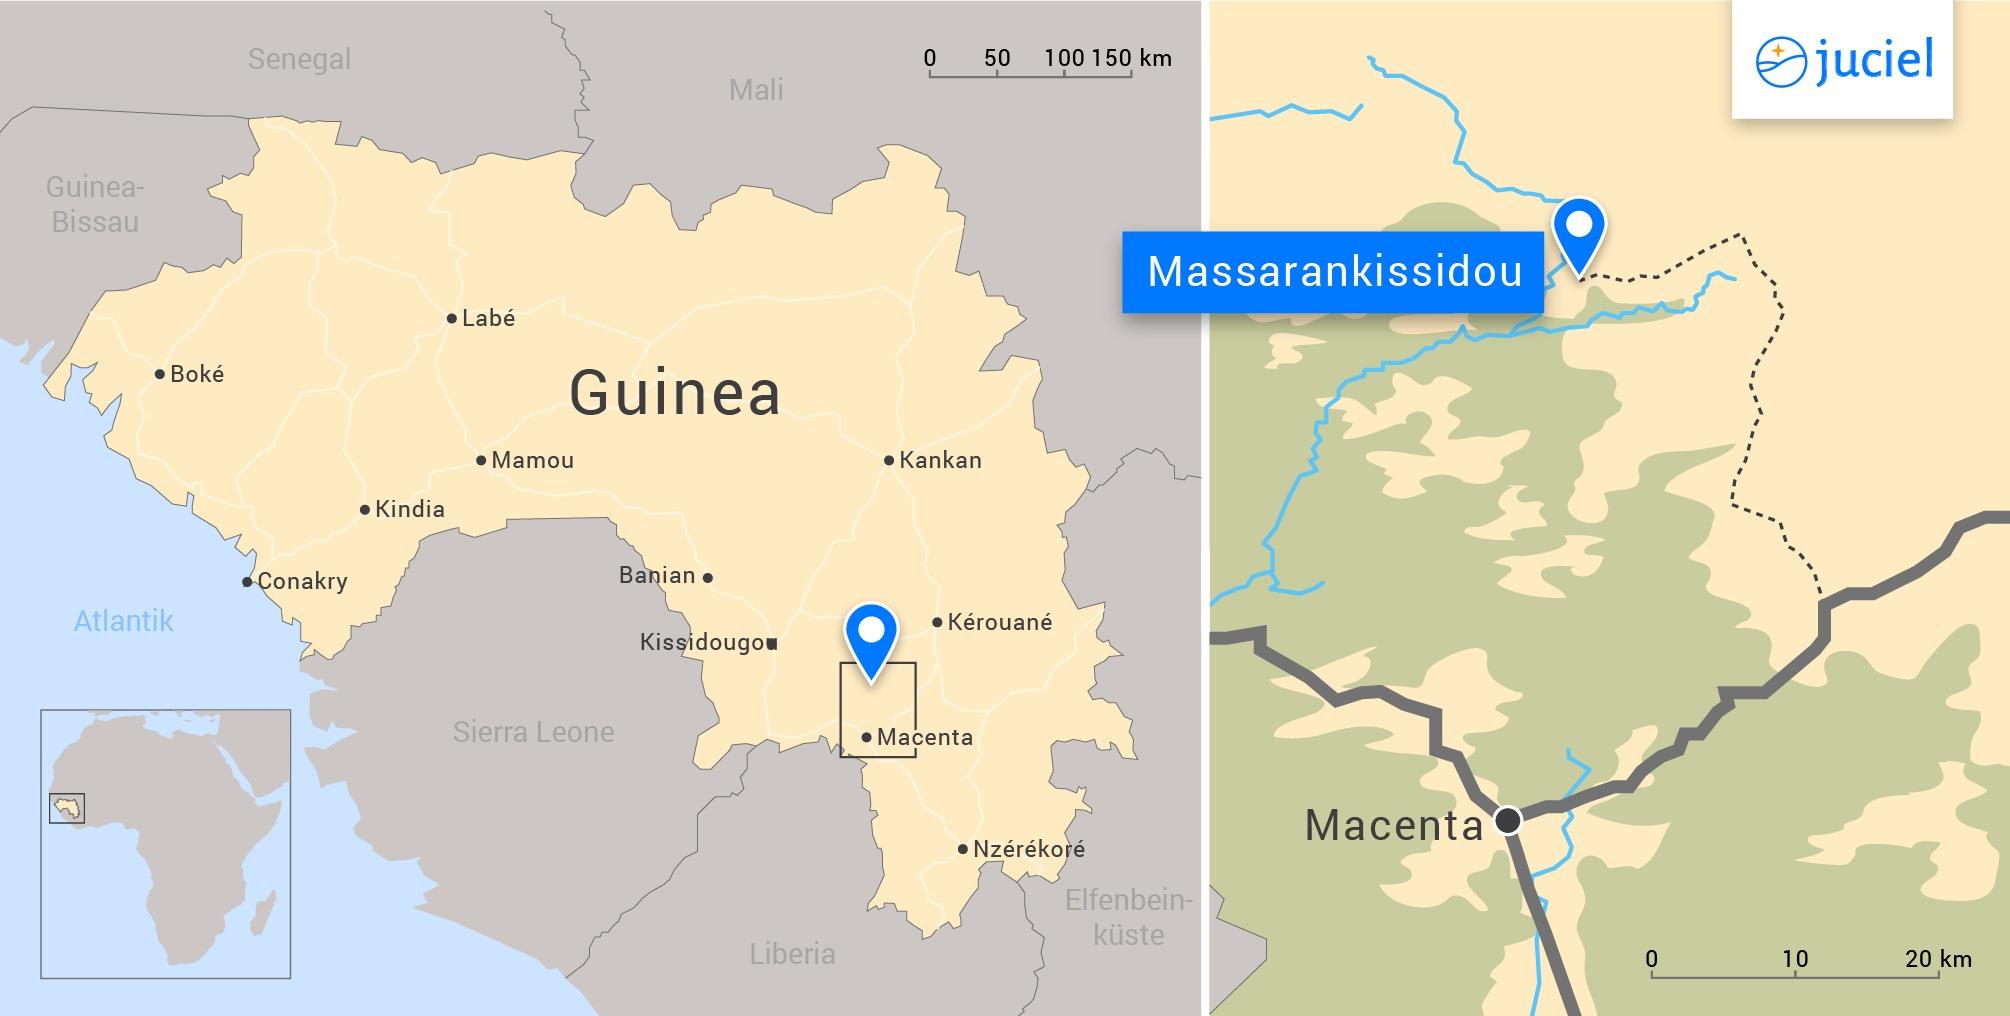 Juciel Guinea